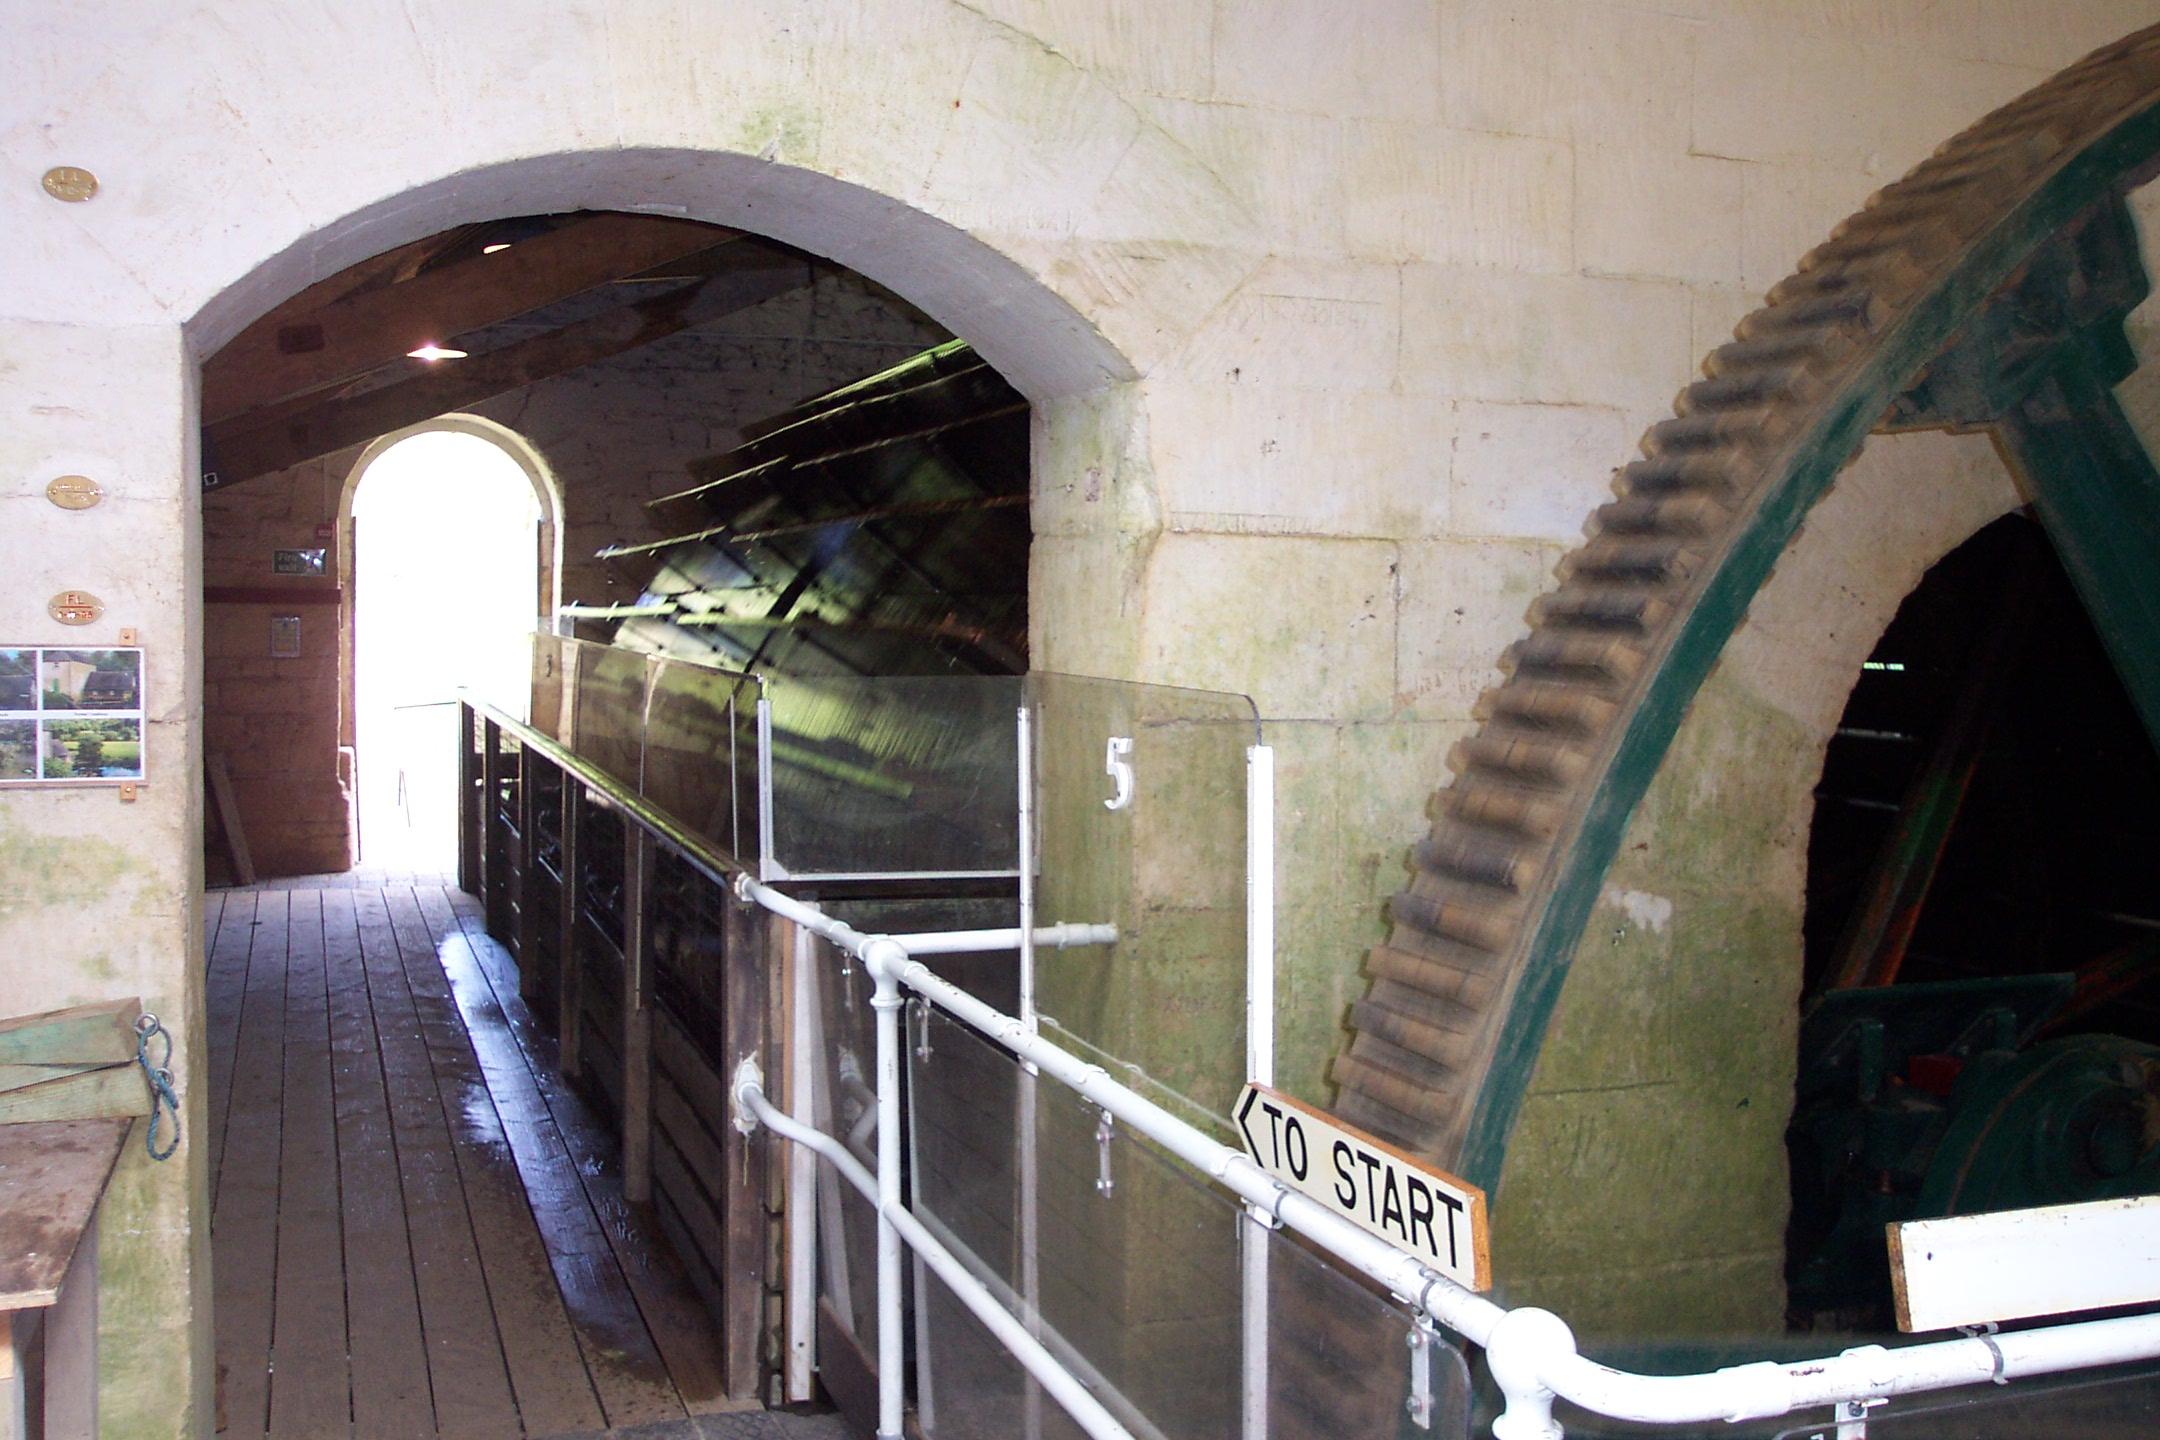 Calverton United Kingdom  city photos gallery : Claverton Pumping Station